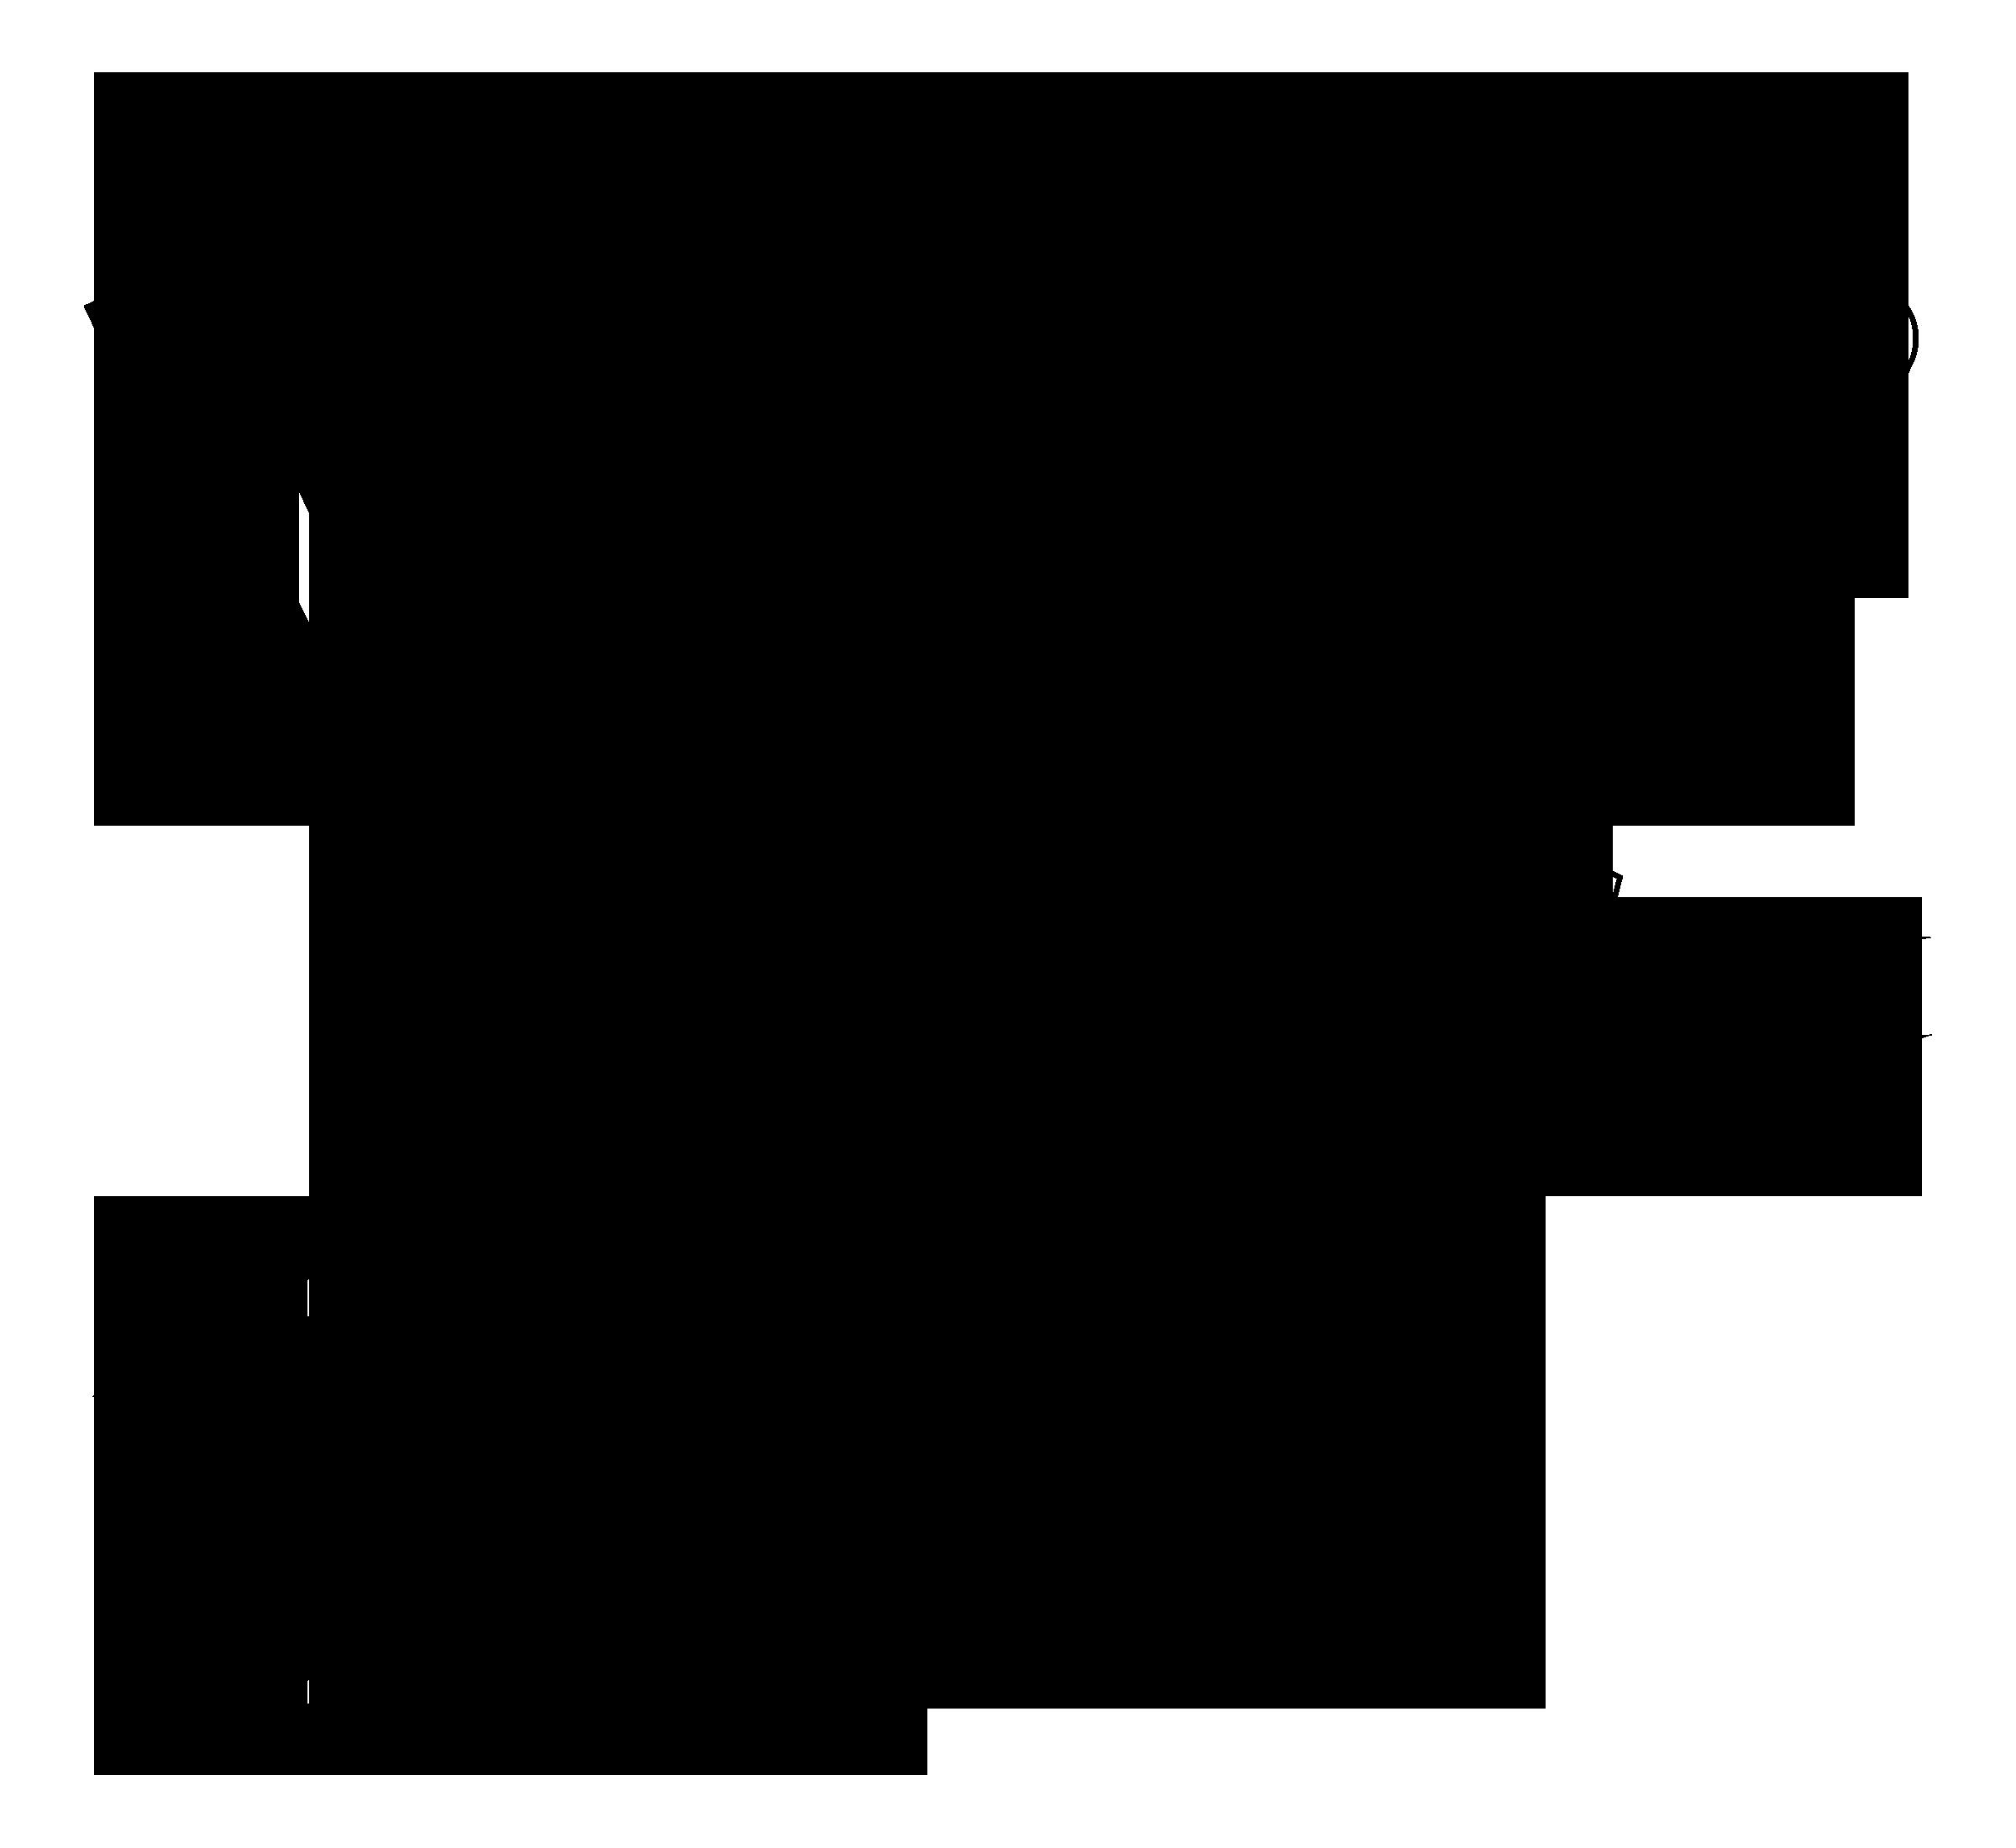 Oklahoma City Thunder Logo PNG Transparent & SVG Vector ...